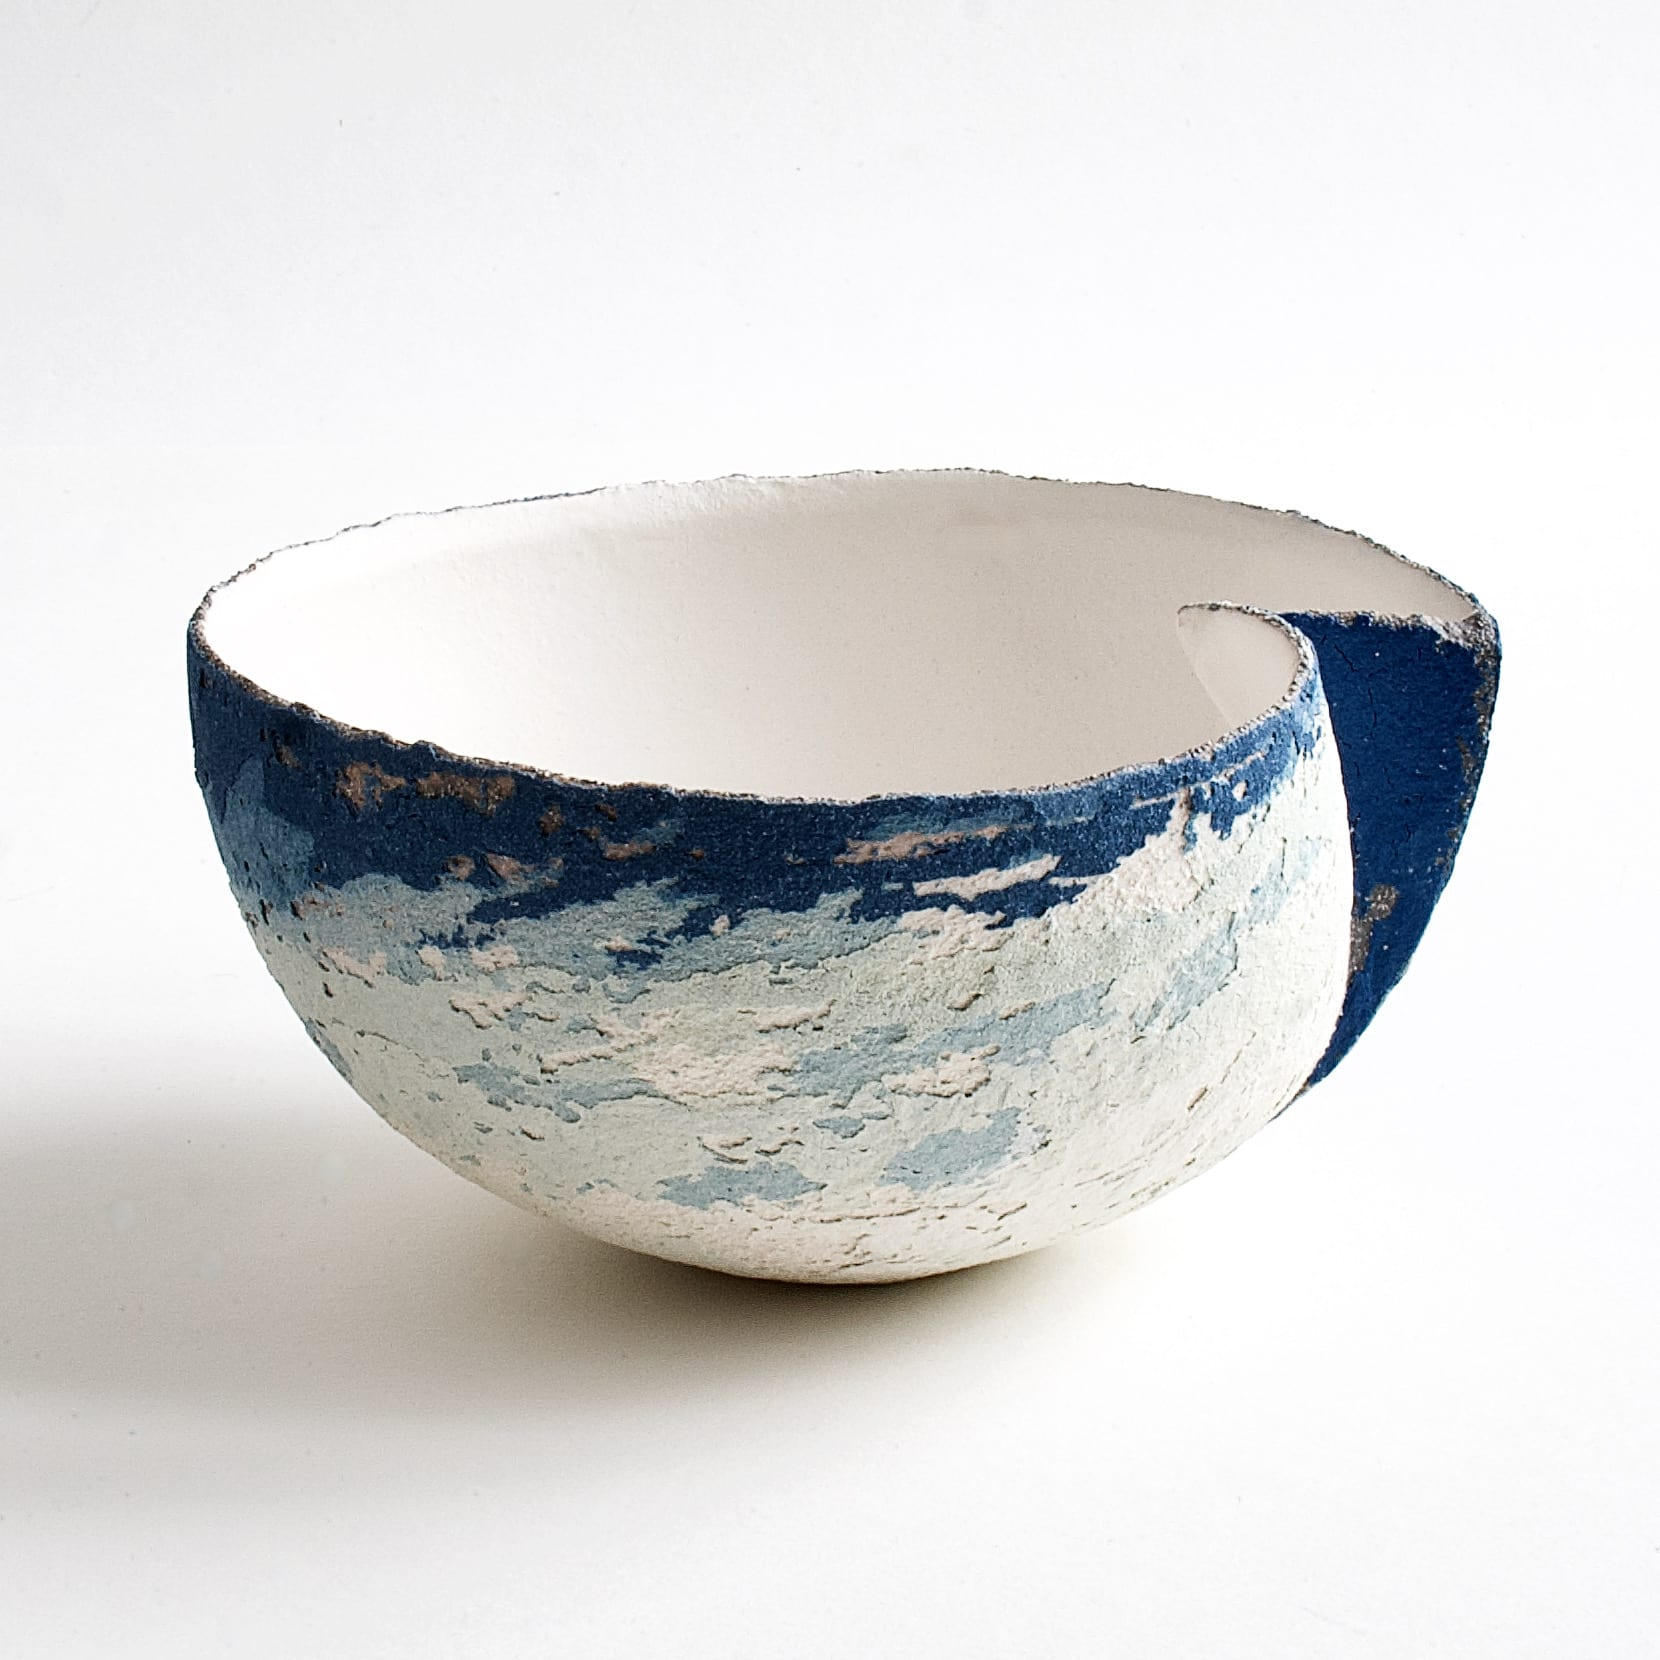 "<span class=""link fancybox-details-link""><a href=""/artists/79-clare-conrad/works/8127-clare-conrad-bowl-with-inset-white-interior-2021/"">View Detail Page</a></span><div class=""artist""><strong>Clare Conrad</strong></div> b. 1948 <div class=""title""><em>Bowl with Inset, white interior</em>, 2021</div> <div class=""medium"">wheel-thrown stoneware </div> <div class=""dimensions"">dia. 16 cm </div><div class=""price"">£275.00</div><div class=""copyright_line"">Own Art: £27.50 x 10 Months, 0% APR</div>"